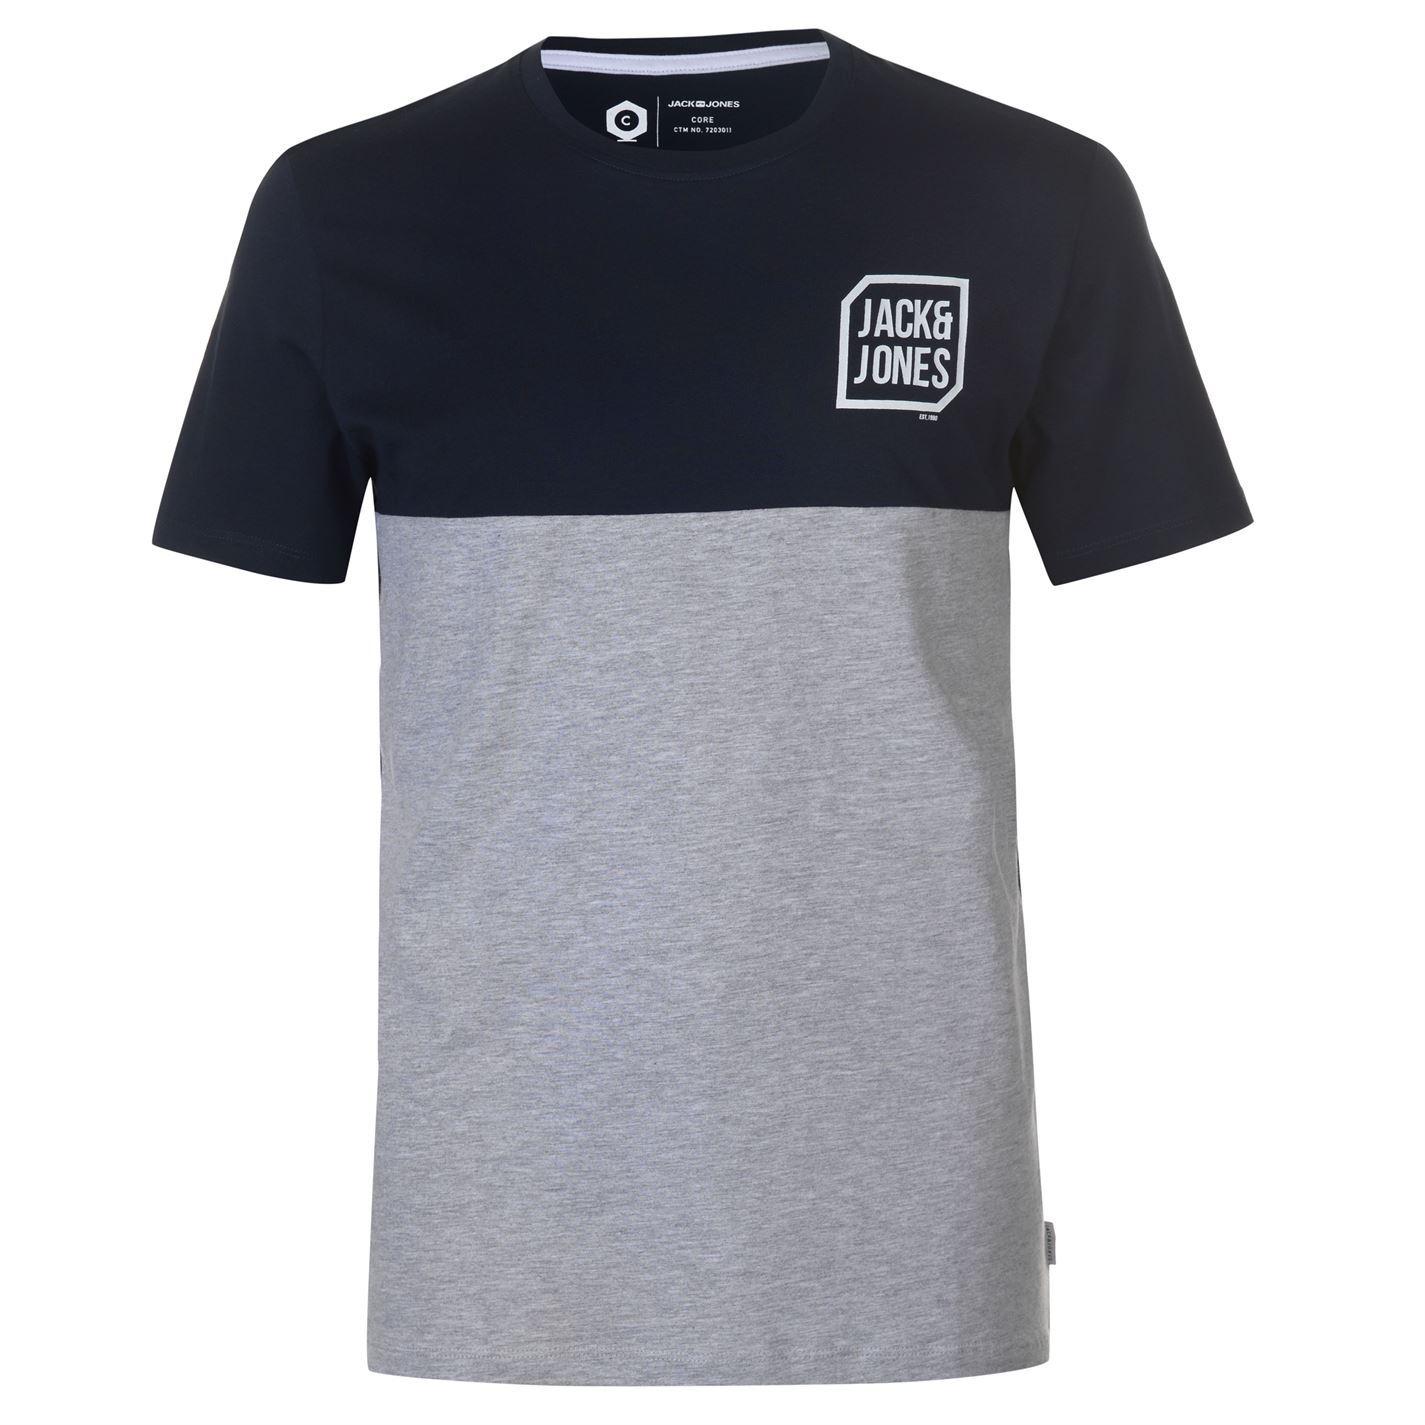 Jack-and-Jones-Core-Tern-T-Shirt-Mens-Tee-Shirt-Top thumbnail 5